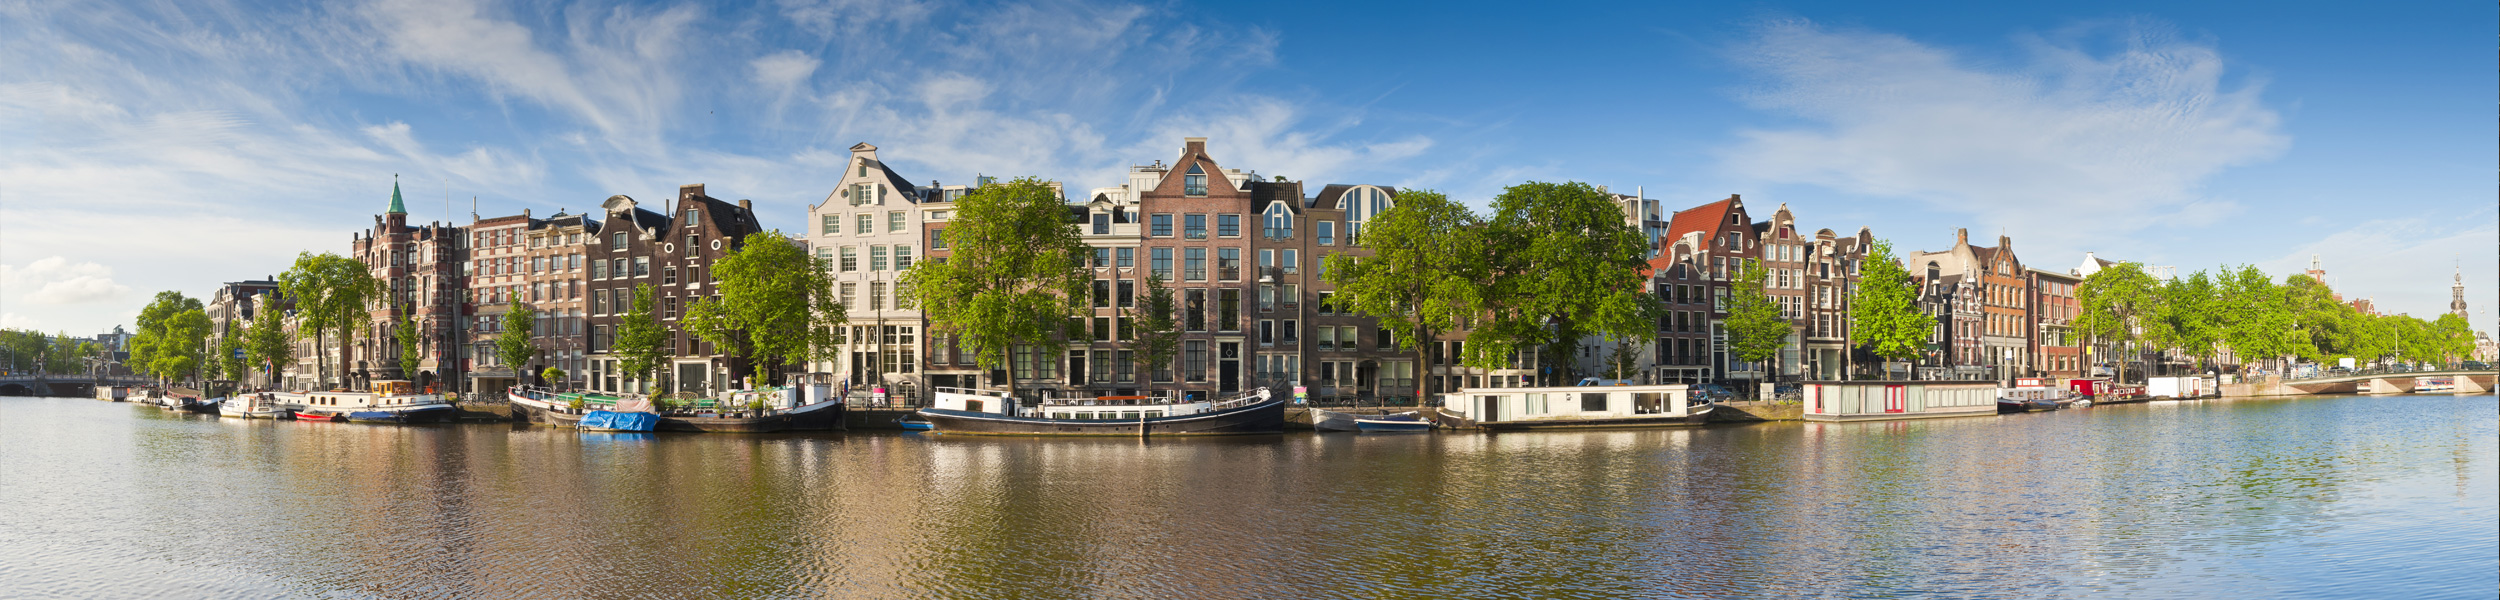 Senior QA Automation Engineer (Remote) Amsterdam, The Netherlands